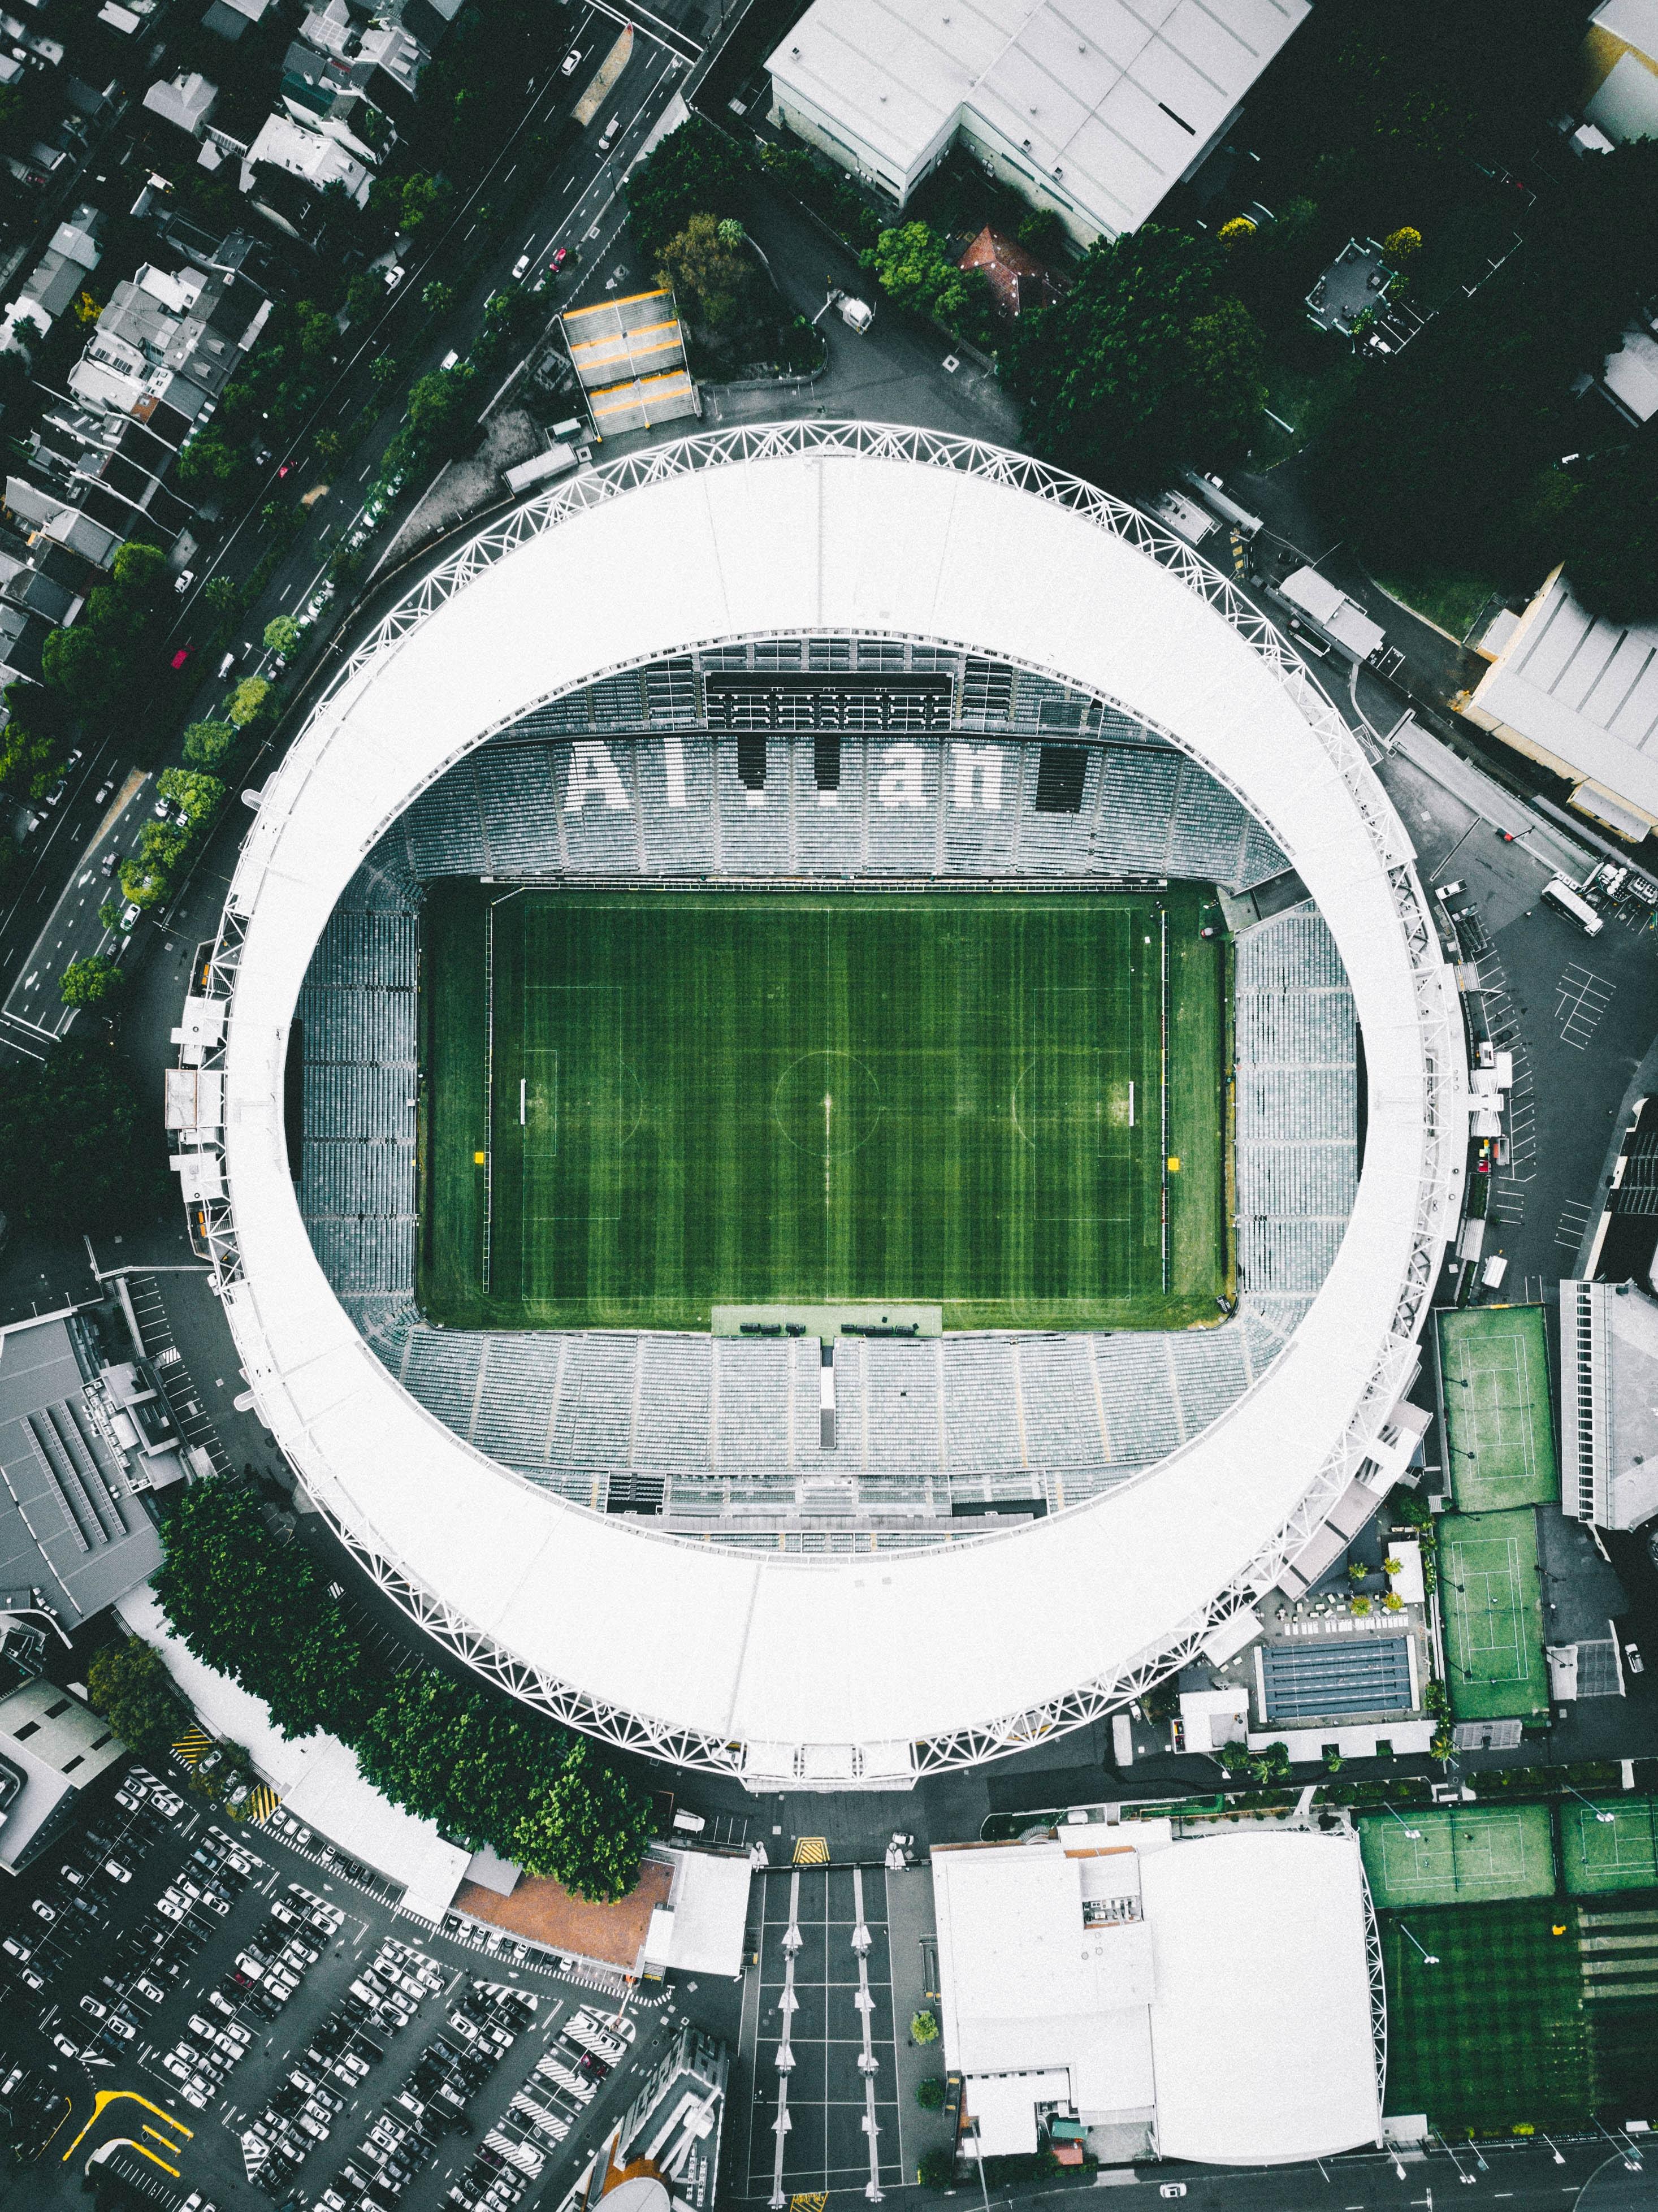 aerial view of green stadium